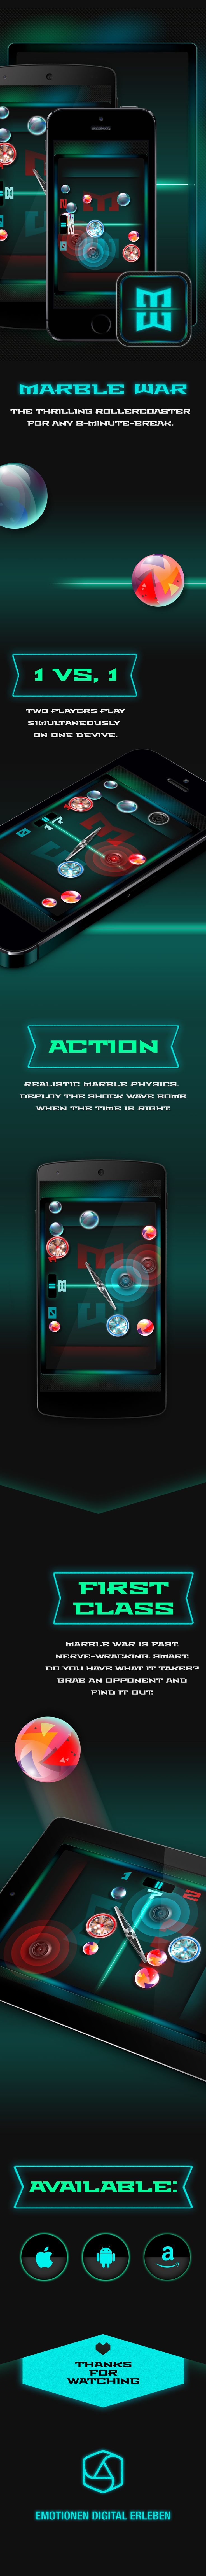 marble war | behance | game | app | UI UX | appcom